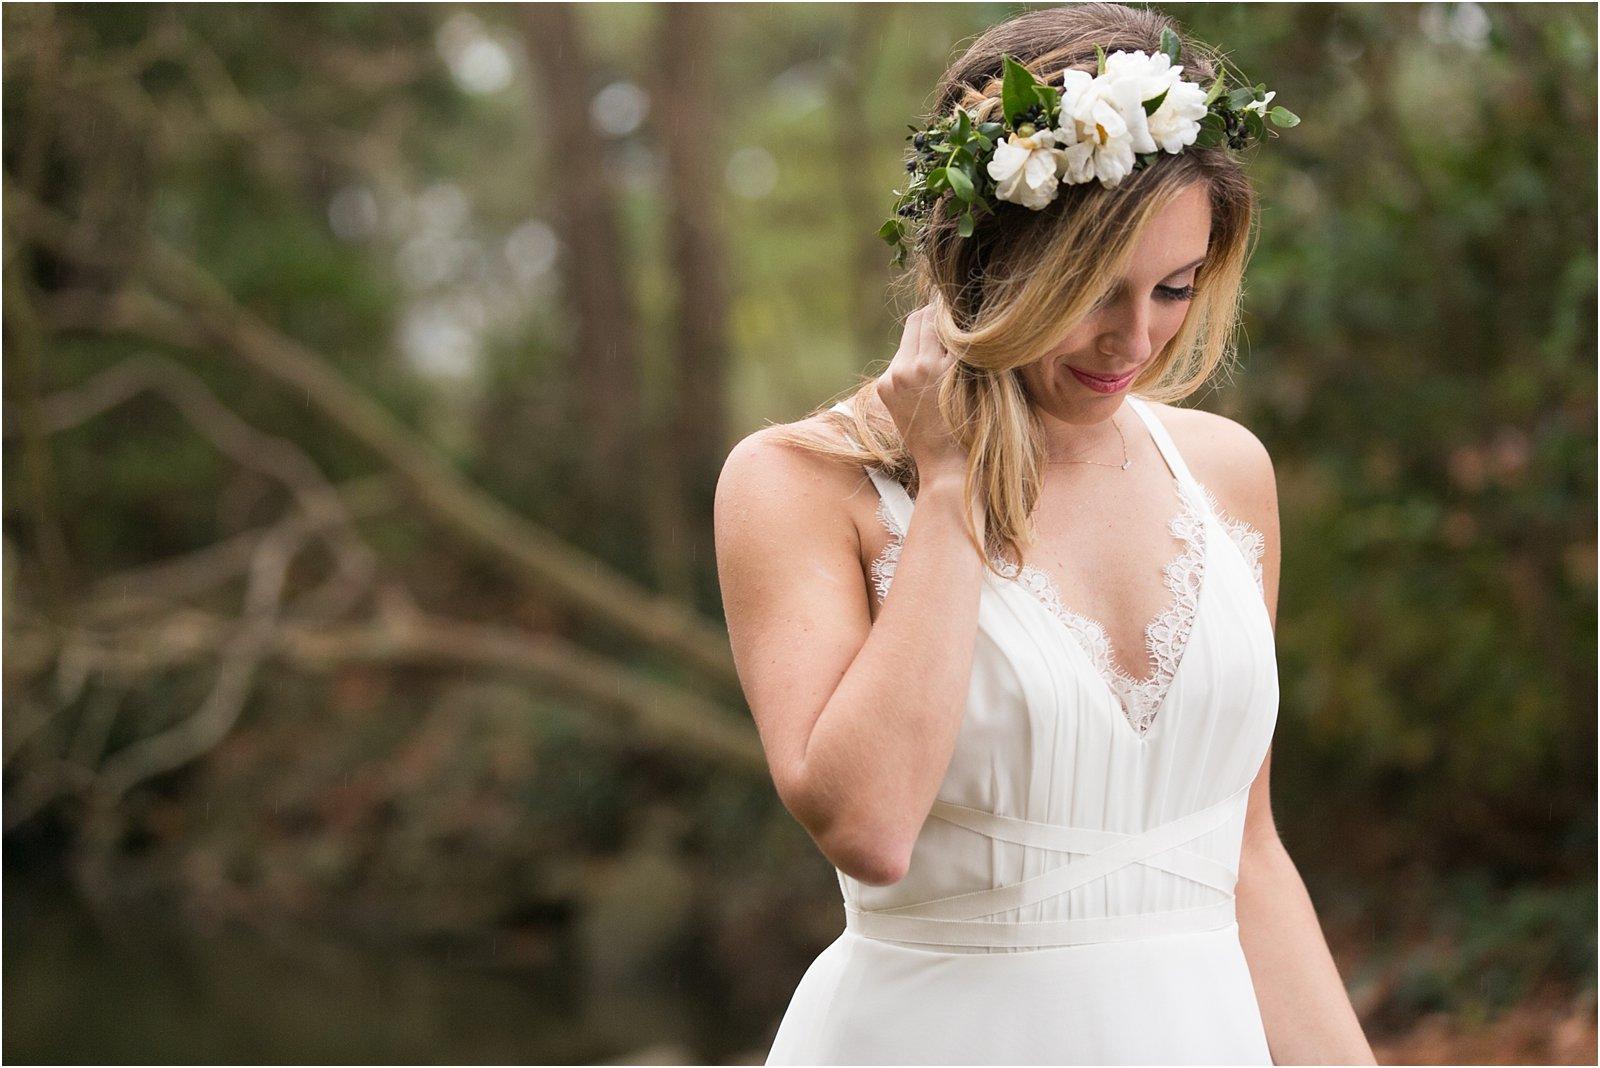 jessica_ryan_photography_womans_club_of_portsmouth_wedding_walk_through_a_wedding_bride_and_groom_0219